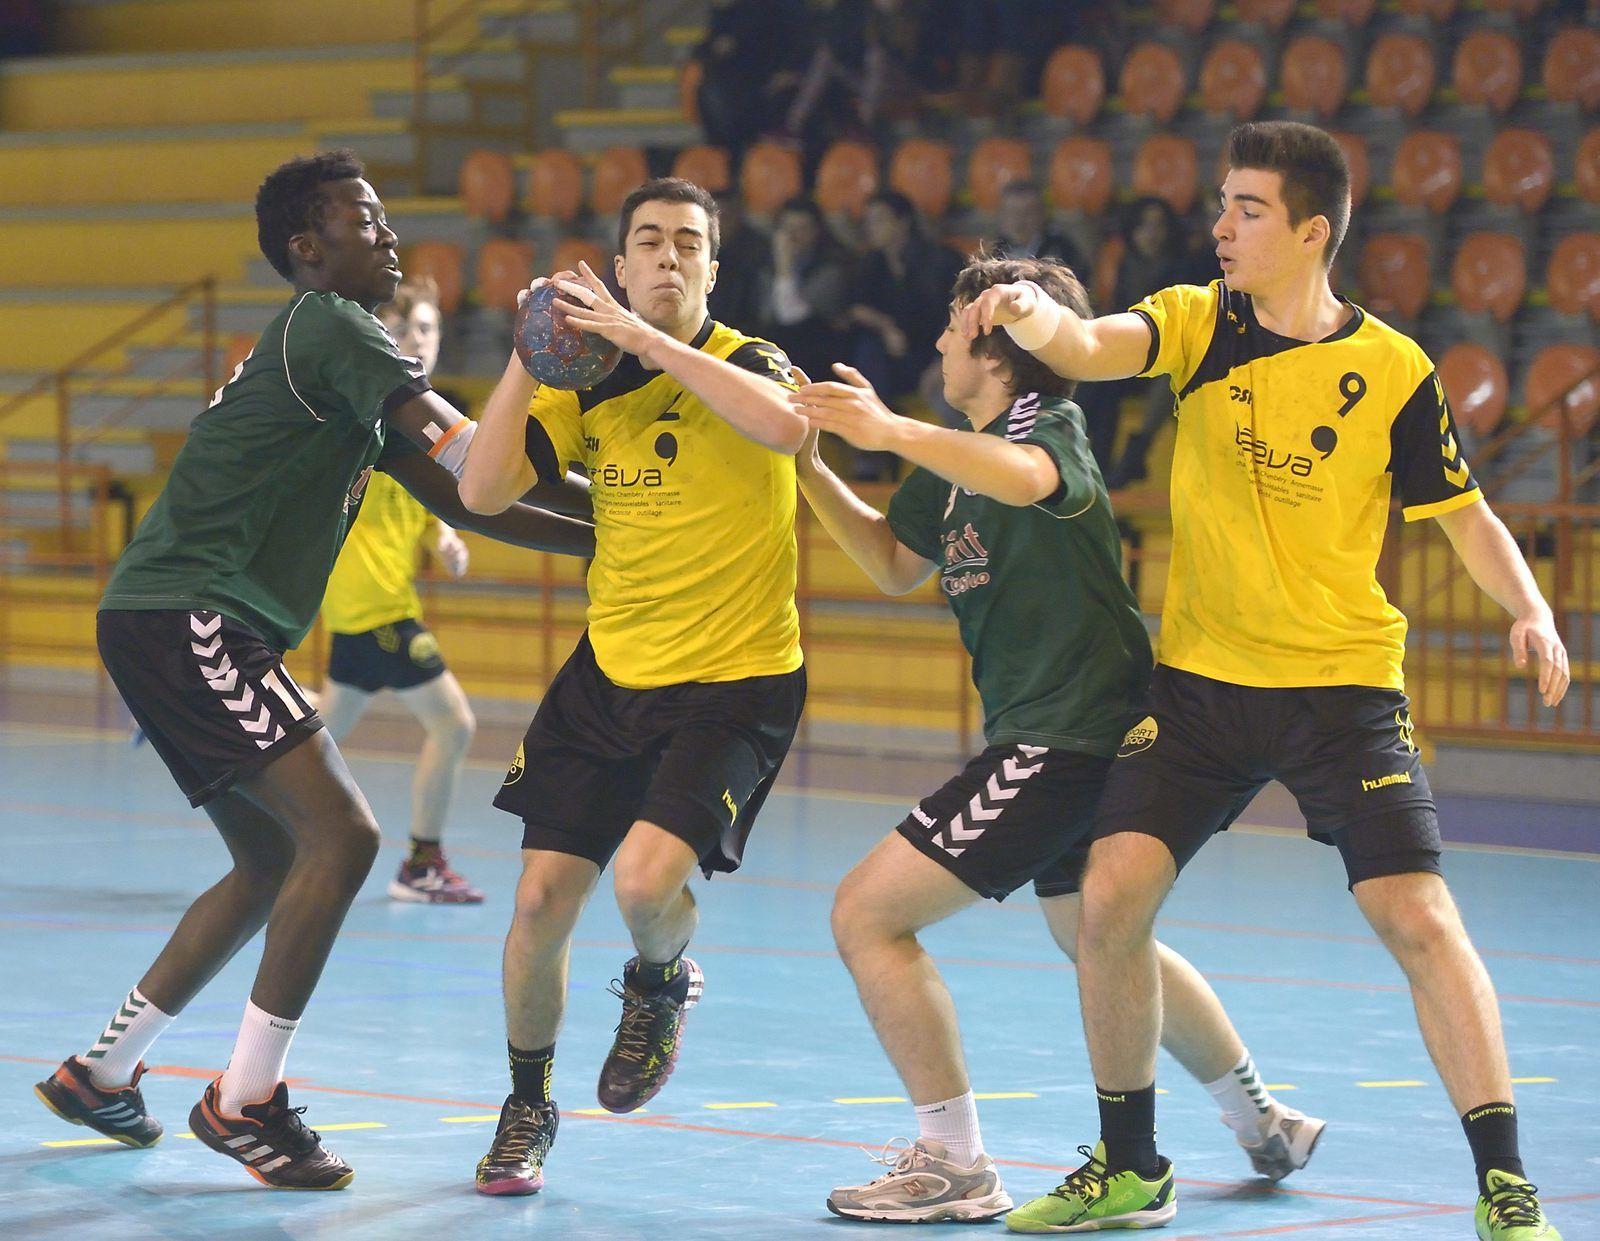 Photos : Jean Pierre RIBOLI / Jean Jaures samedi 14 mars 2015